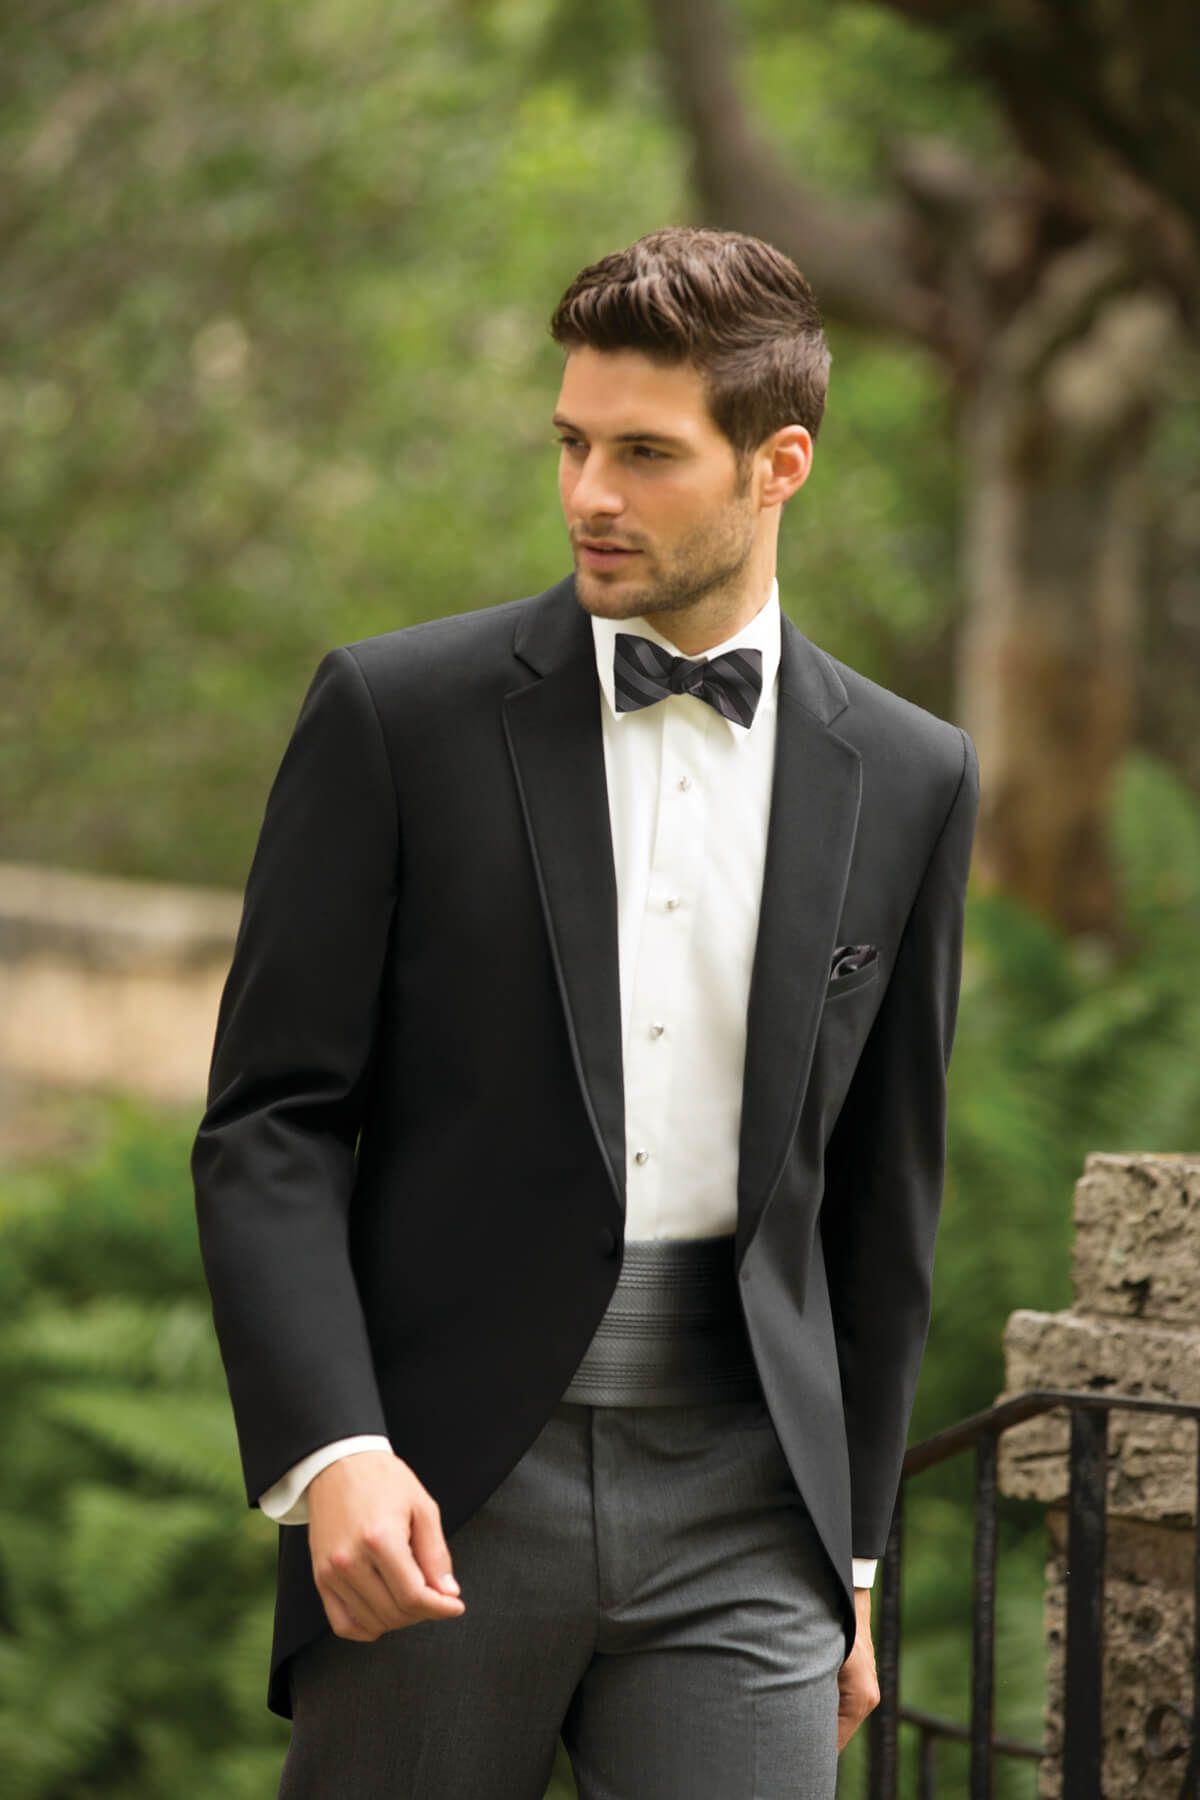 Matching Shirt With Black Tuxedo